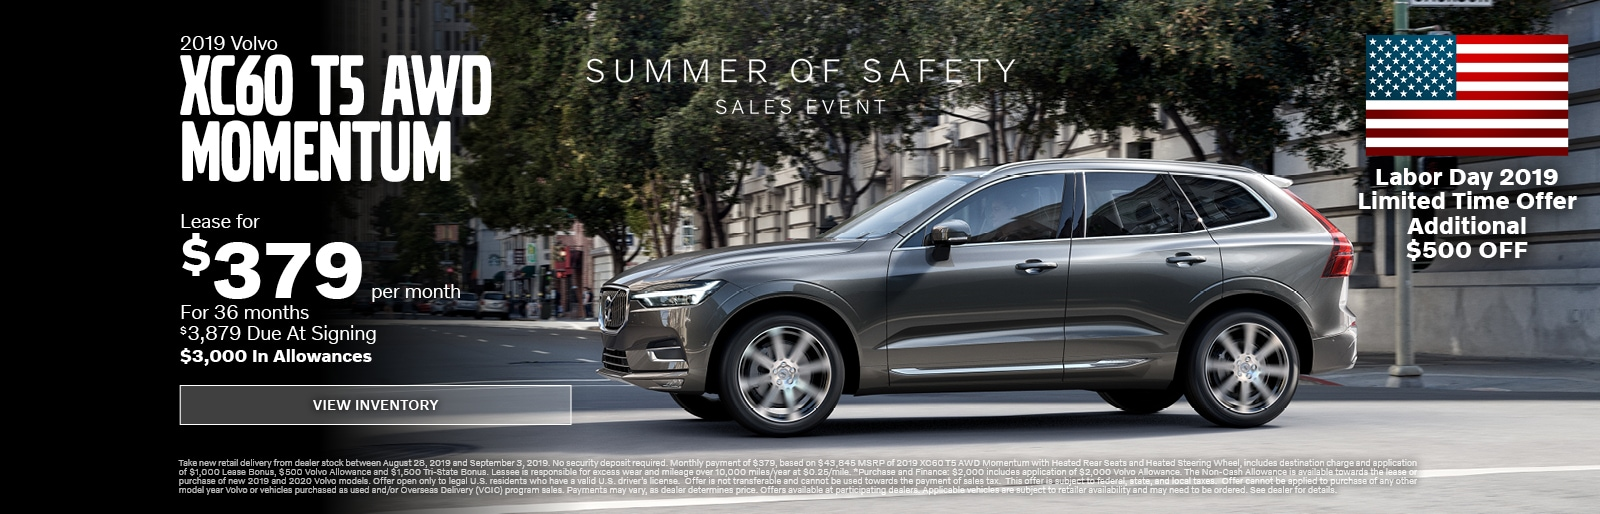 Volvo Dealership Near Me >> Volvo Cars Keene East Swanzey Nh New Used Volvo